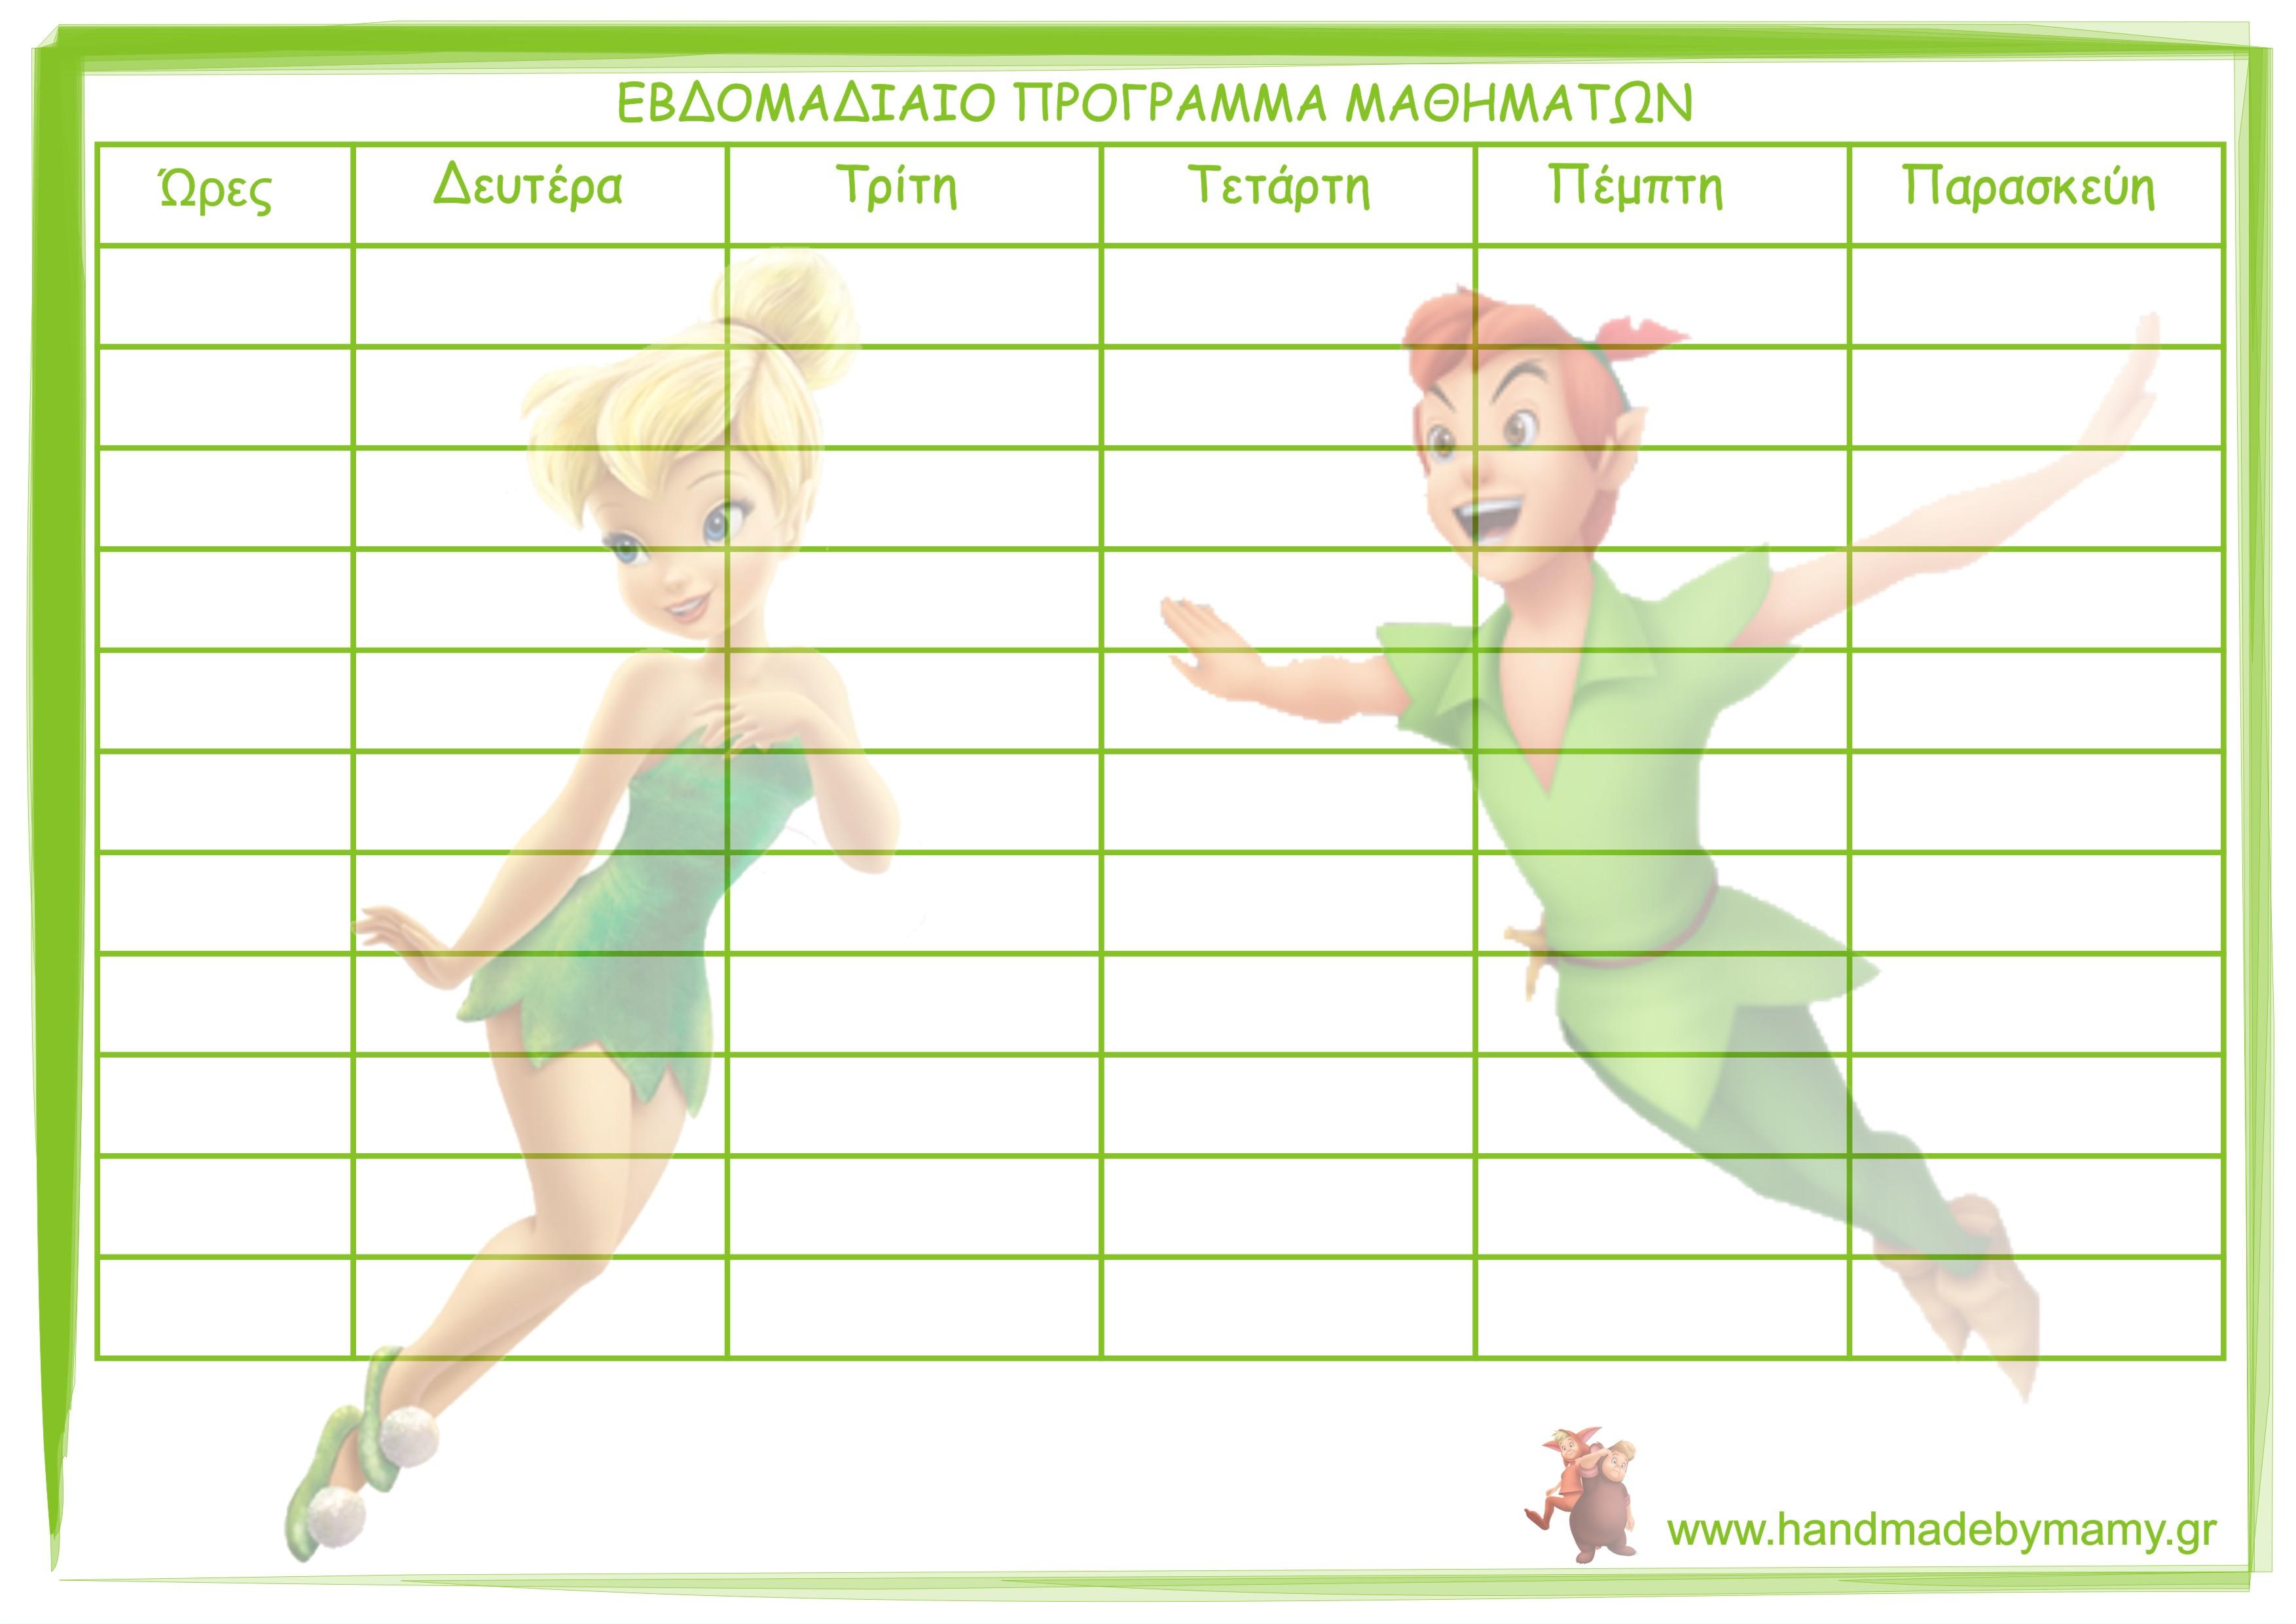 Sxoliko programma_3(1)